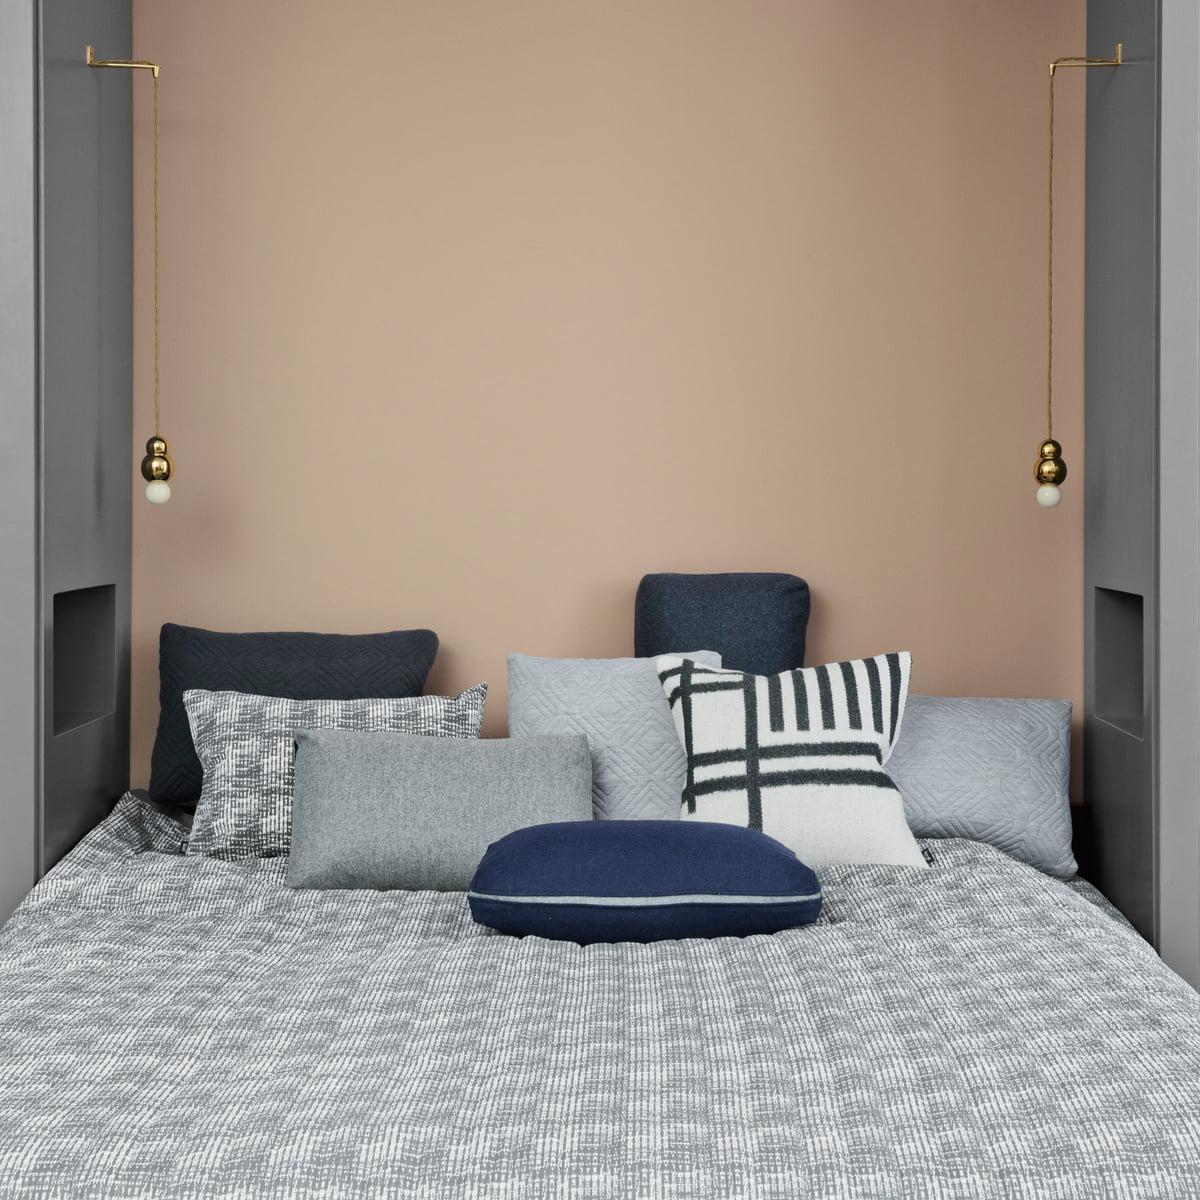 ferm living quilt kissen im shop kaufen. Black Bedroom Furniture Sets. Home Design Ideas